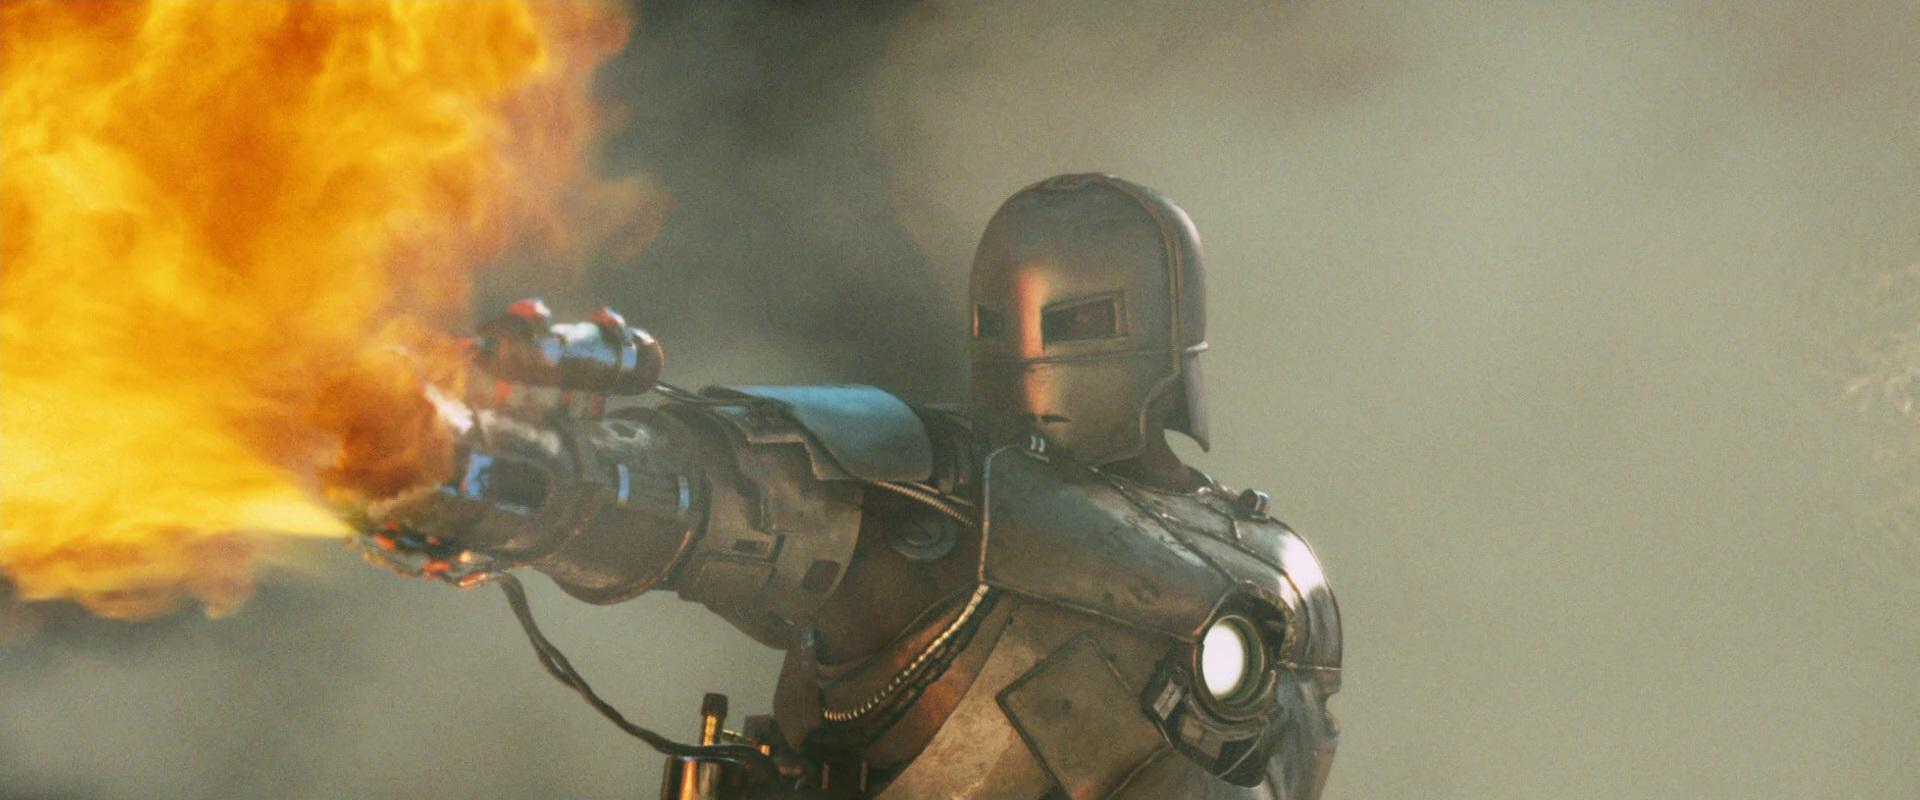 File:Iron Man Mark I Flamethrower.jpg